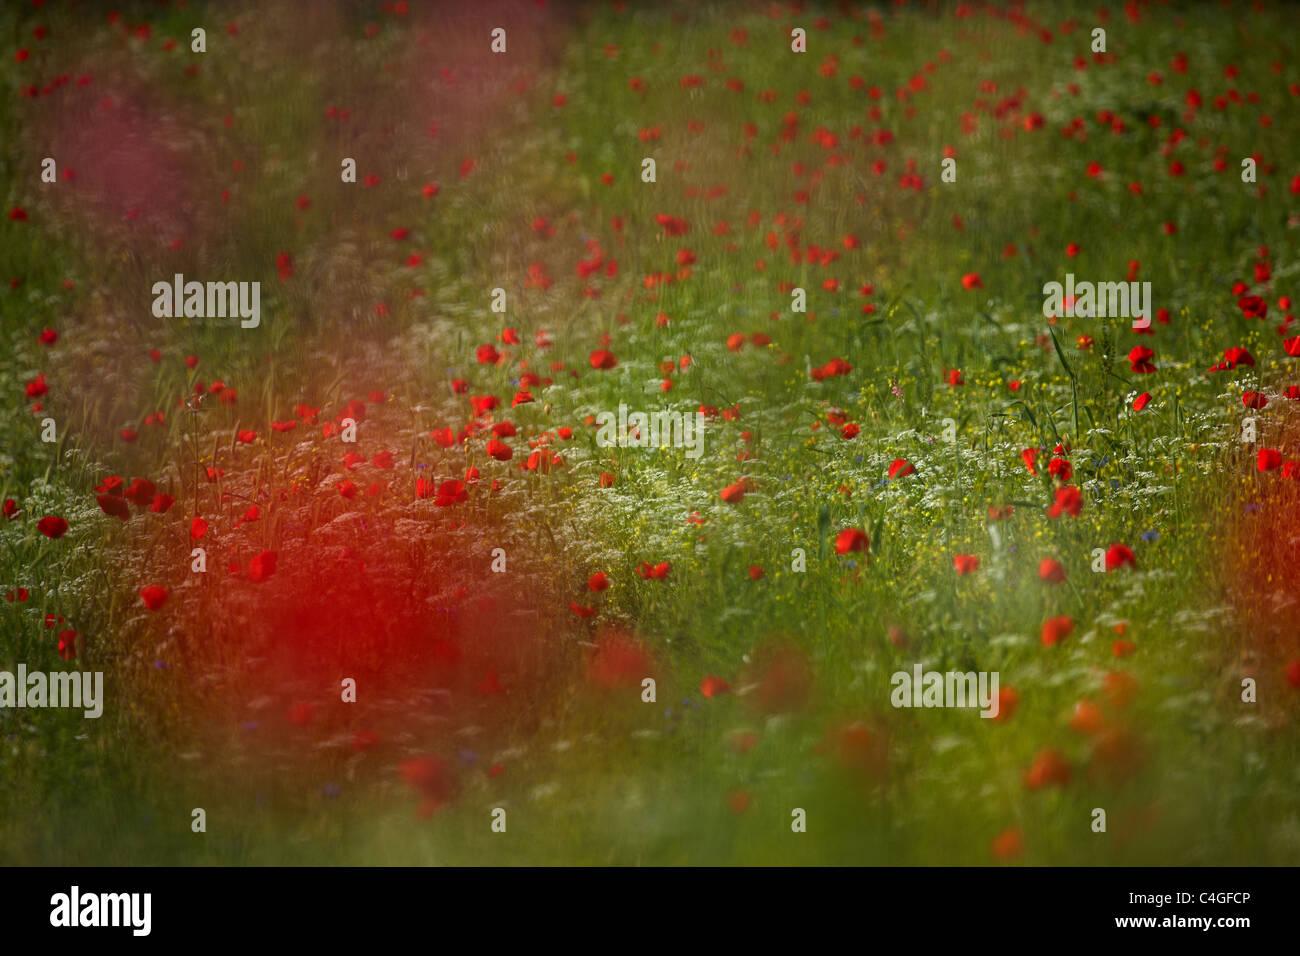 poppies in the Valnerina nr Campi, Umbria, Italy - Stock Image